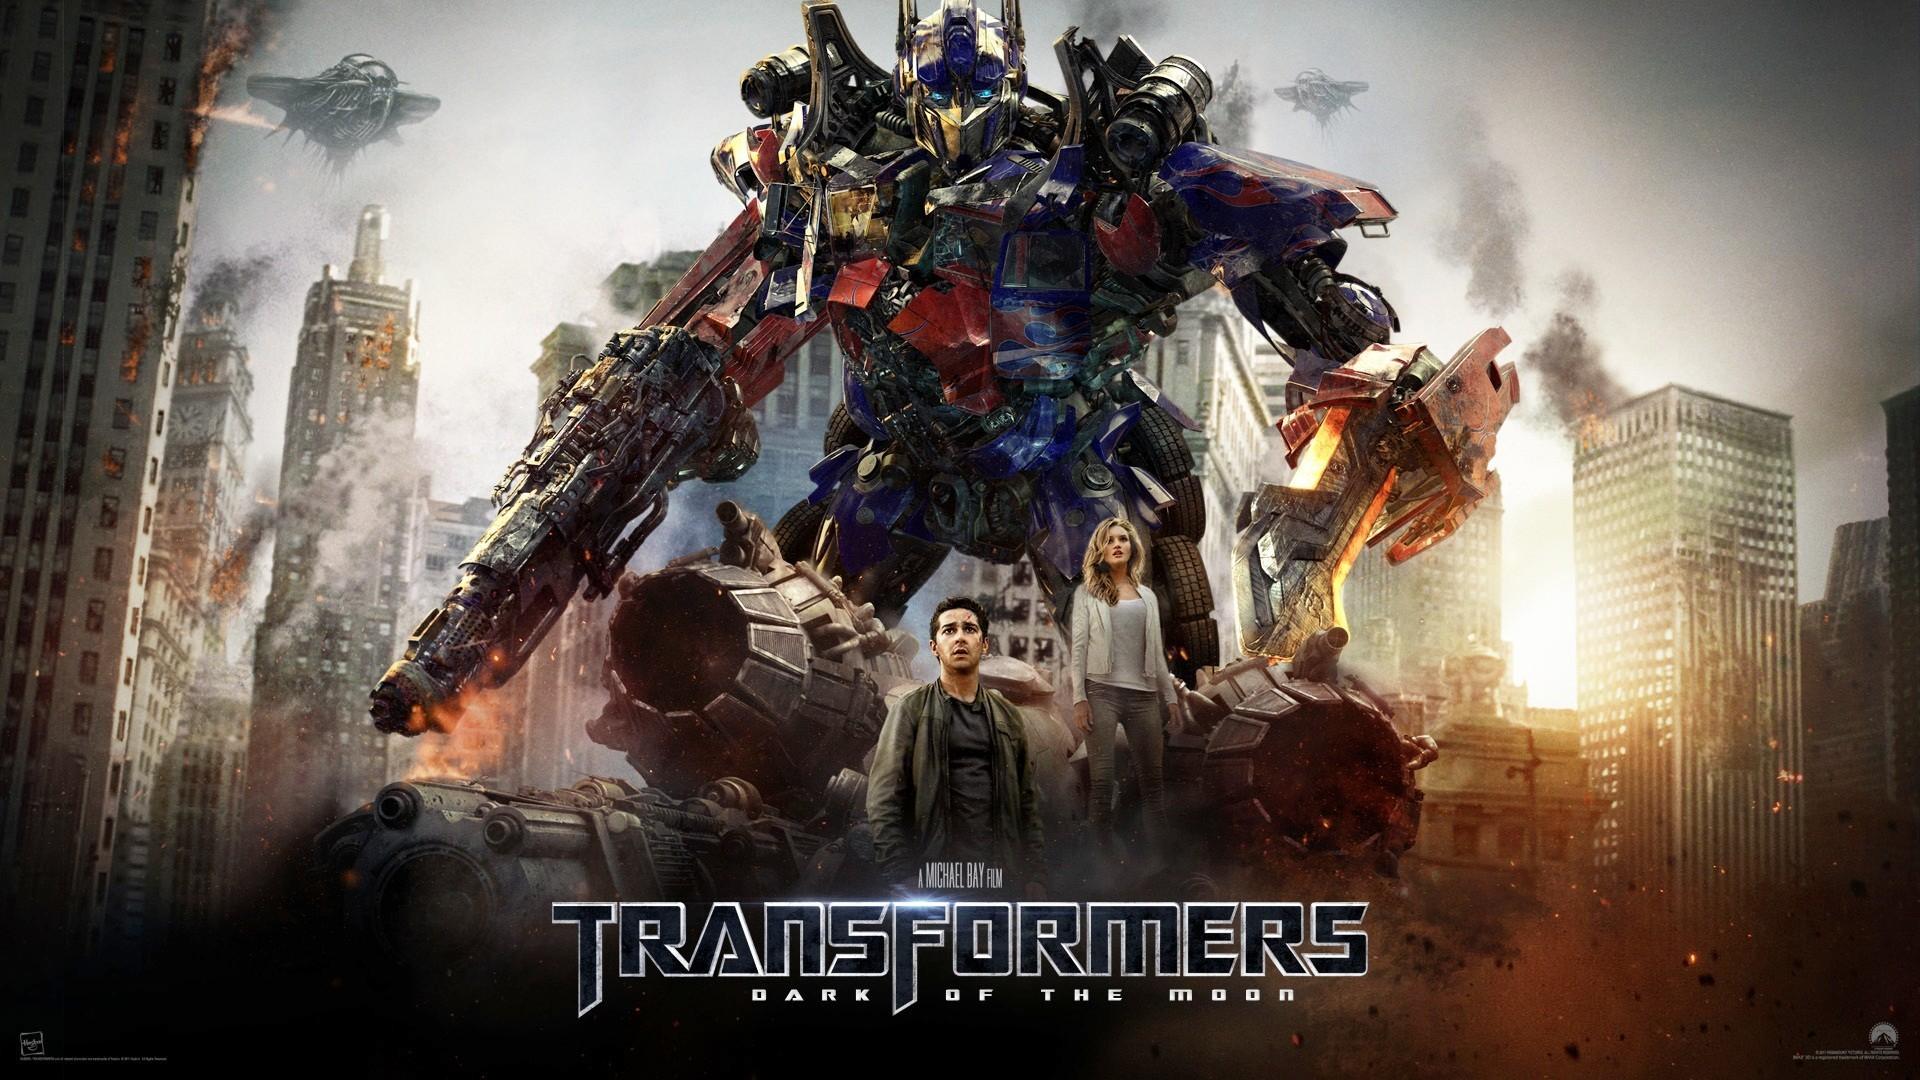 … x 1080 Original. Description: Download Optimus Prime …